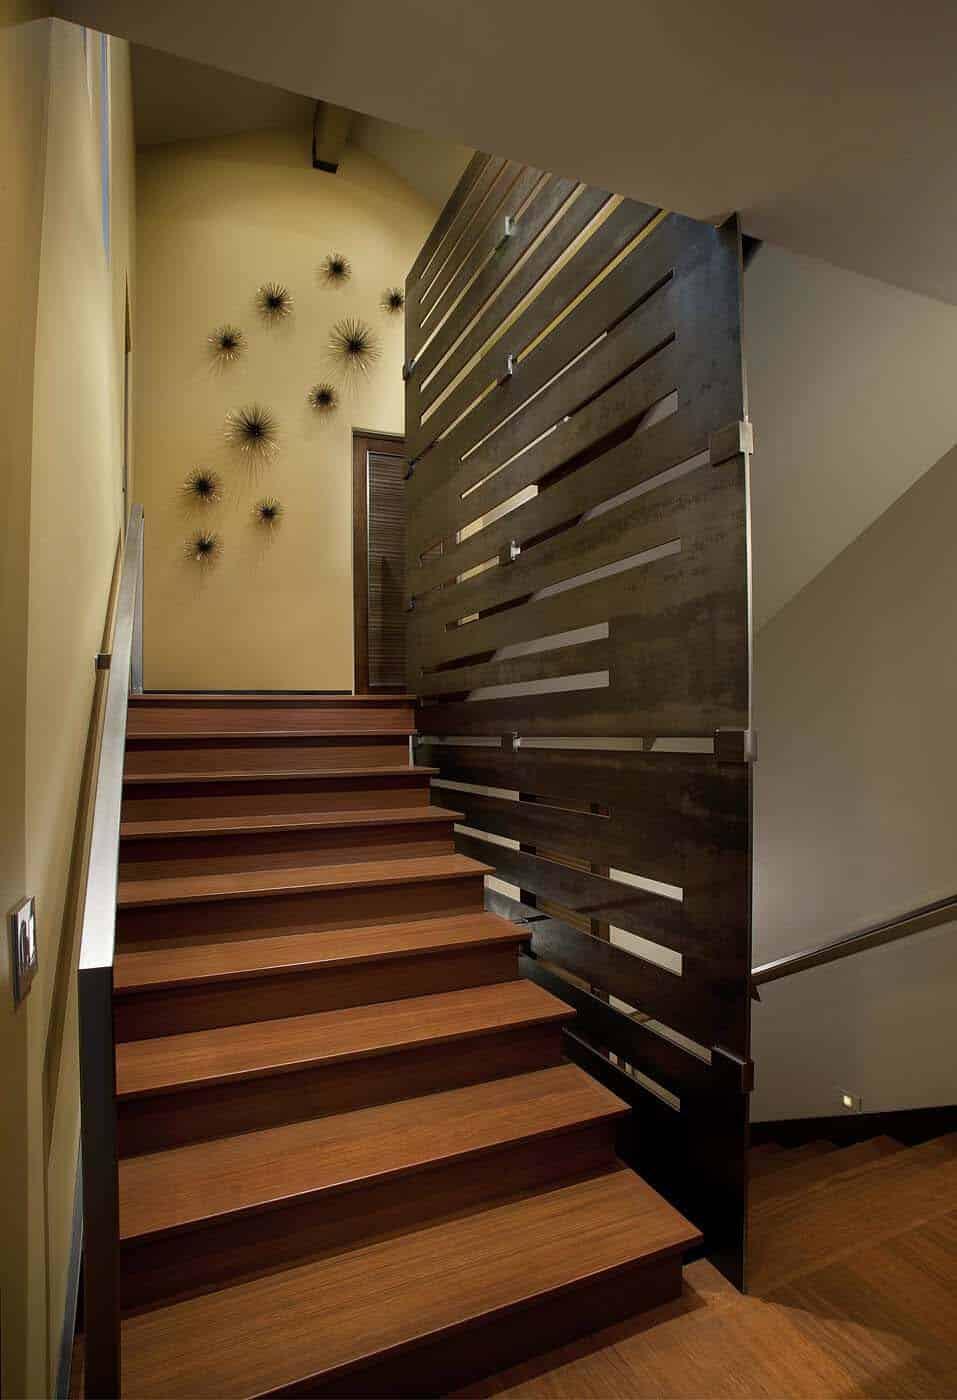 Architecture moderne de montagne-IMI Design-12-1 Kindesign